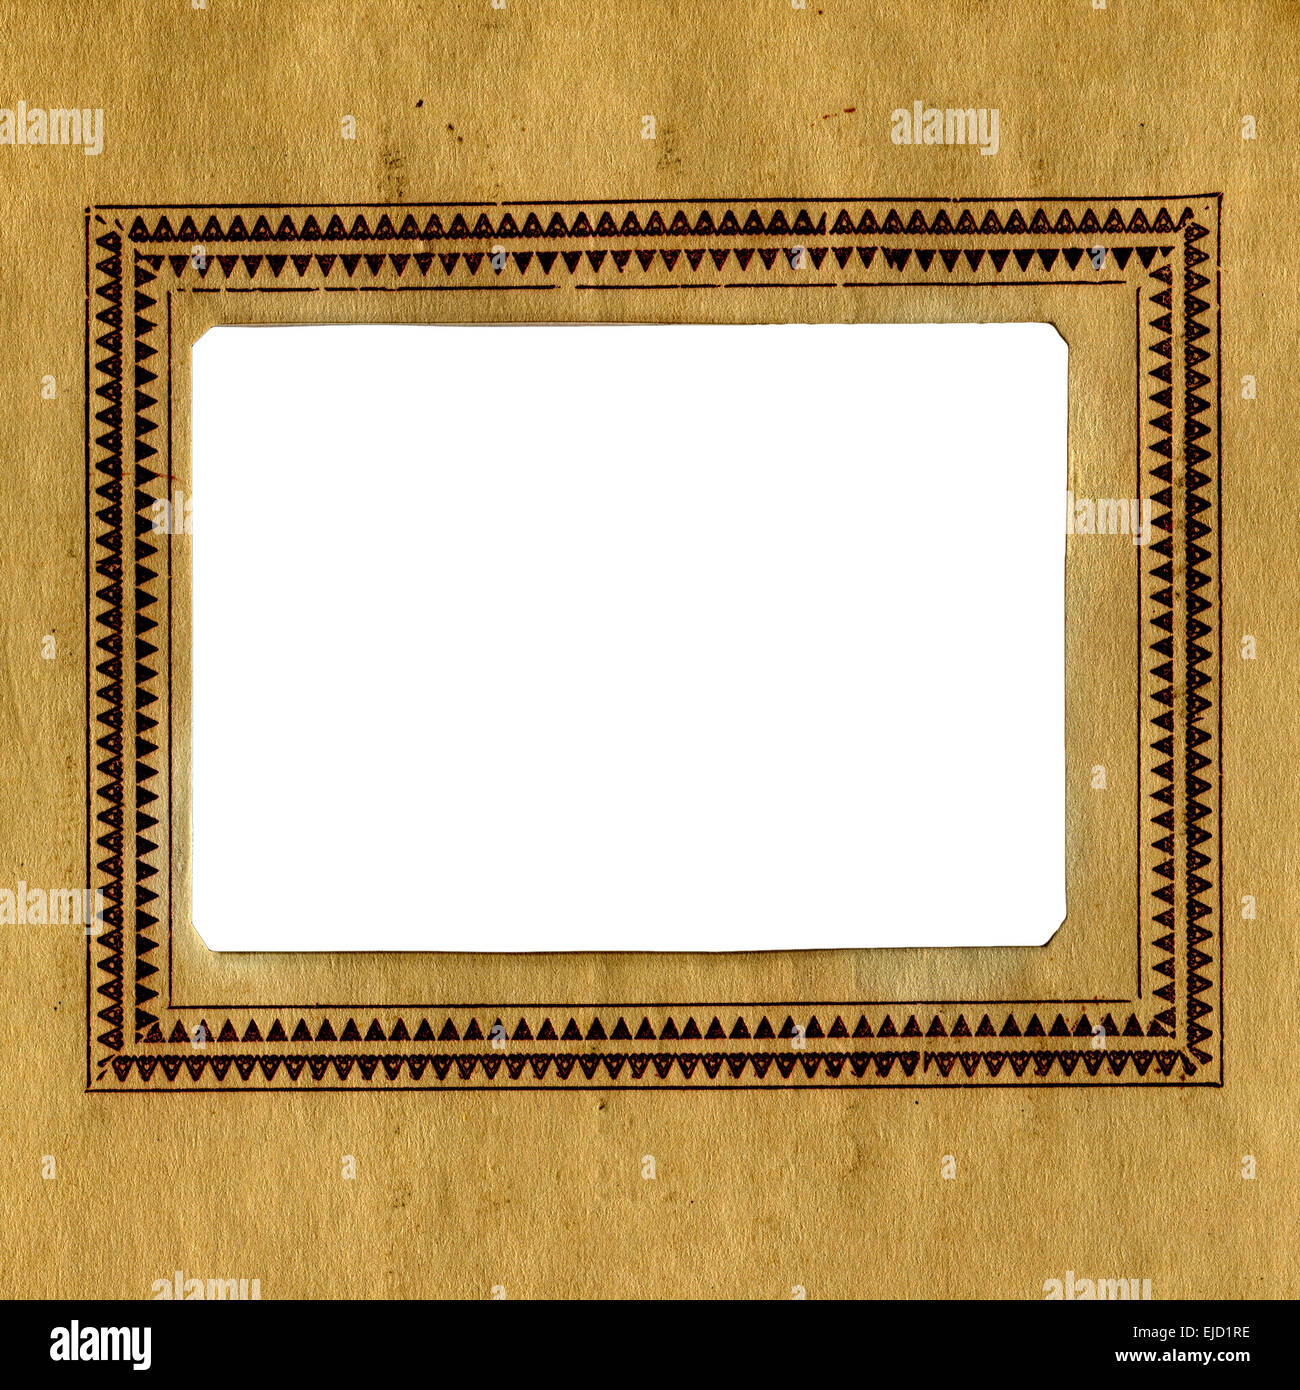 Großzügig Framing Für Den Trockenbau Fotos - Rahmen Ideen ...